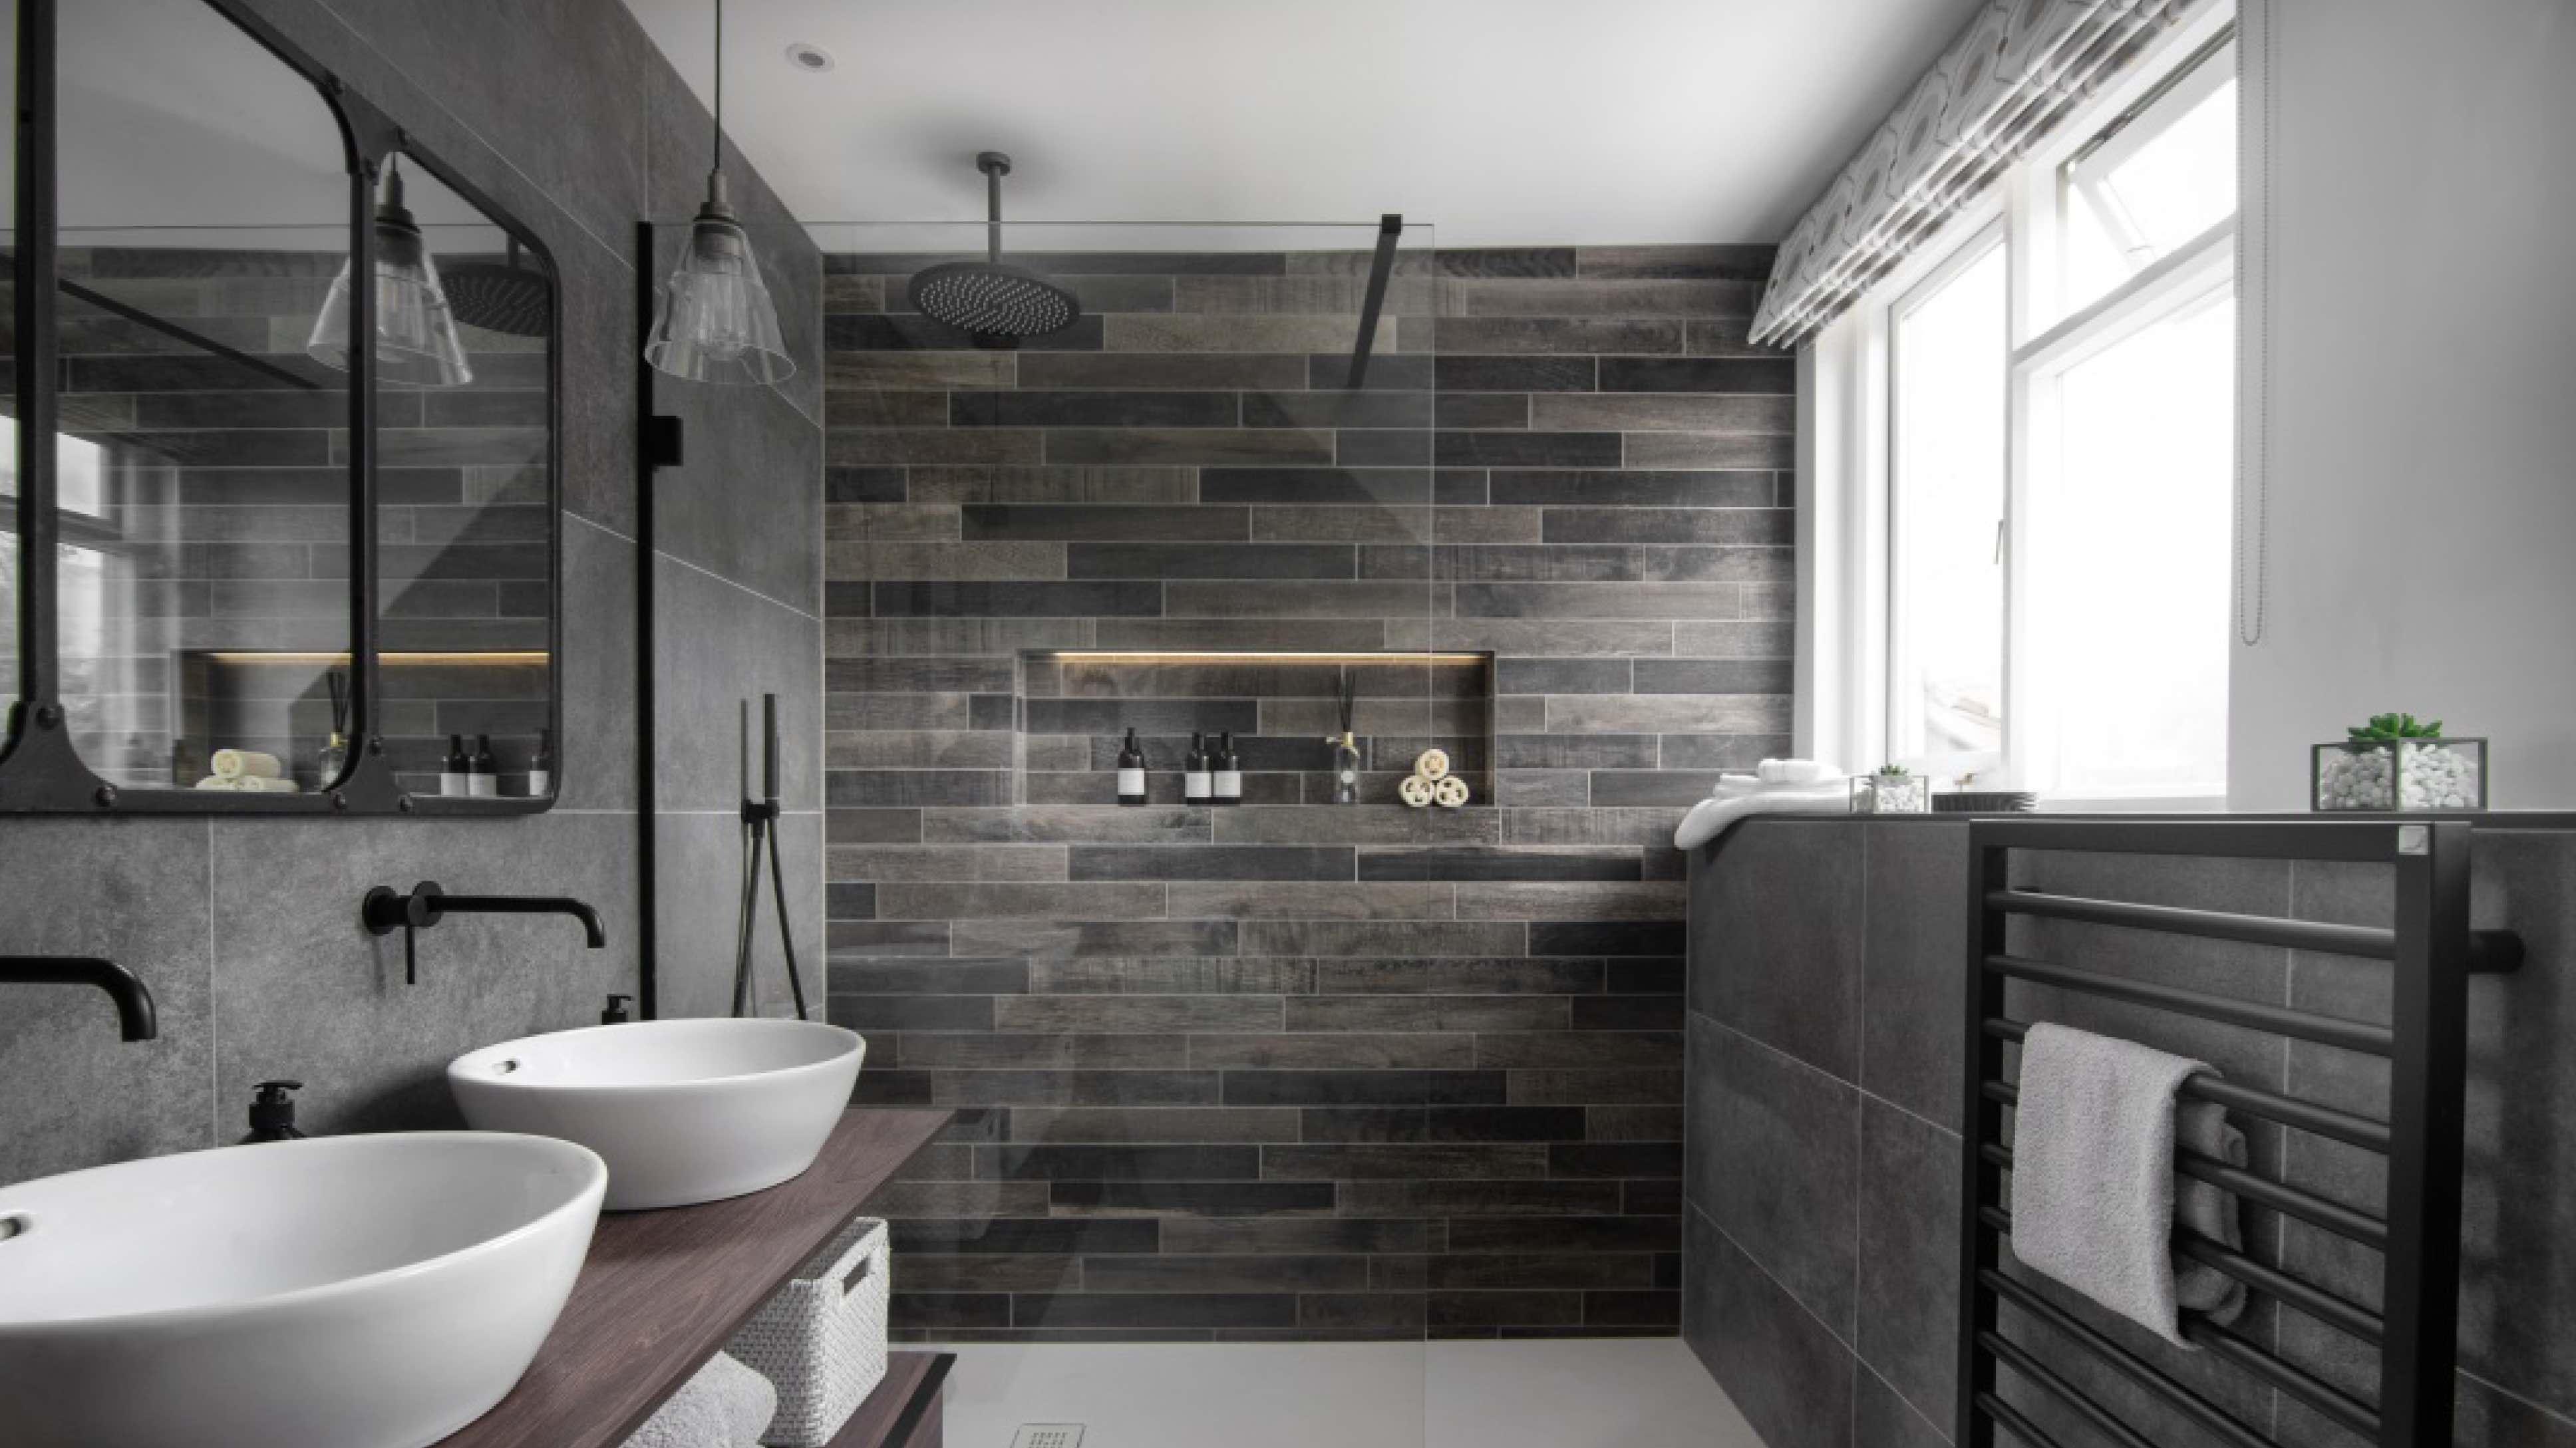 Ripples - Luxury Bathroom Designers, Suppliers with UK ...